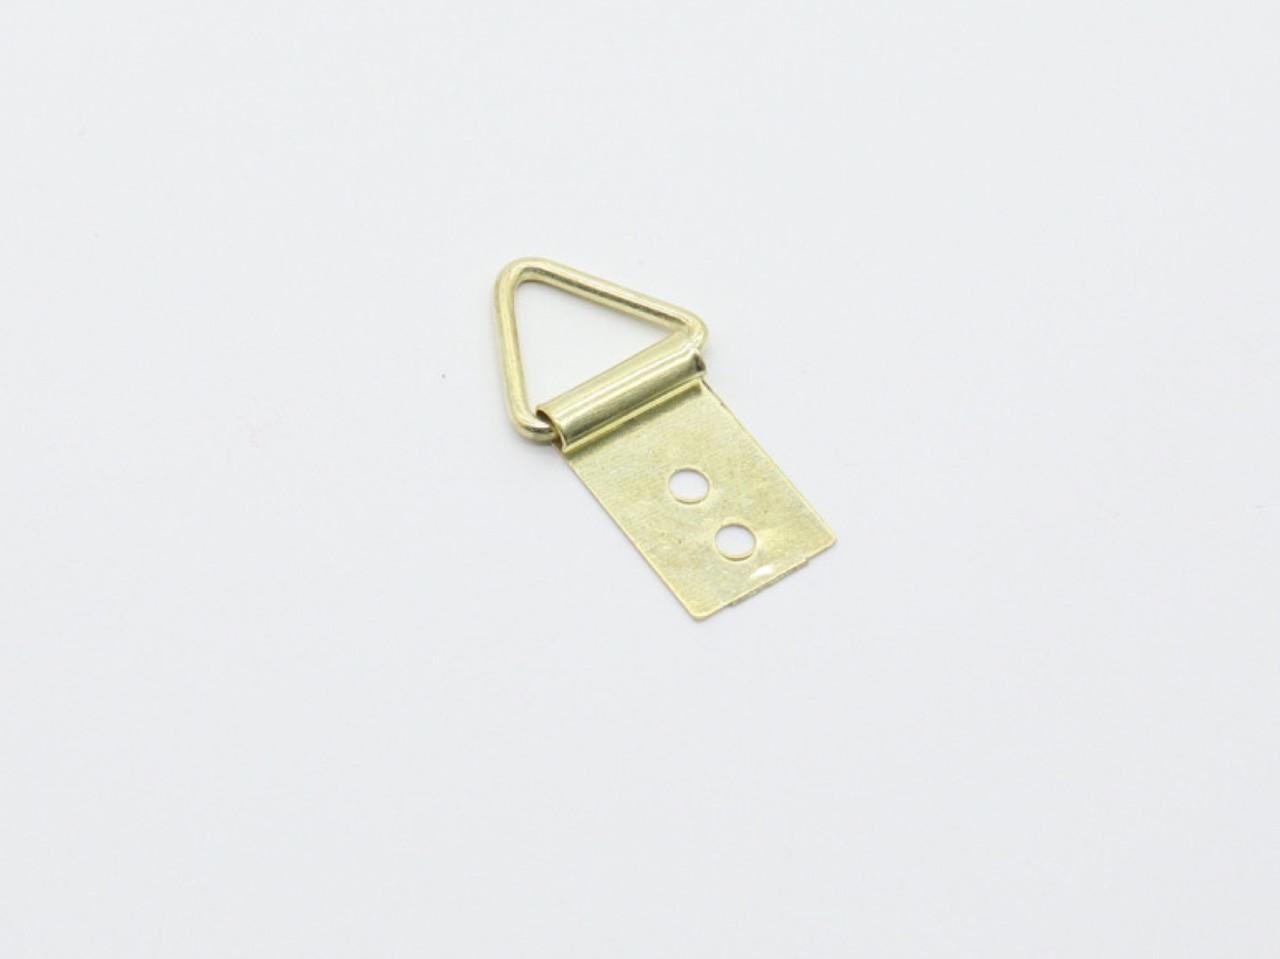 Петля для рамок. Цвет золото. 30х13мм